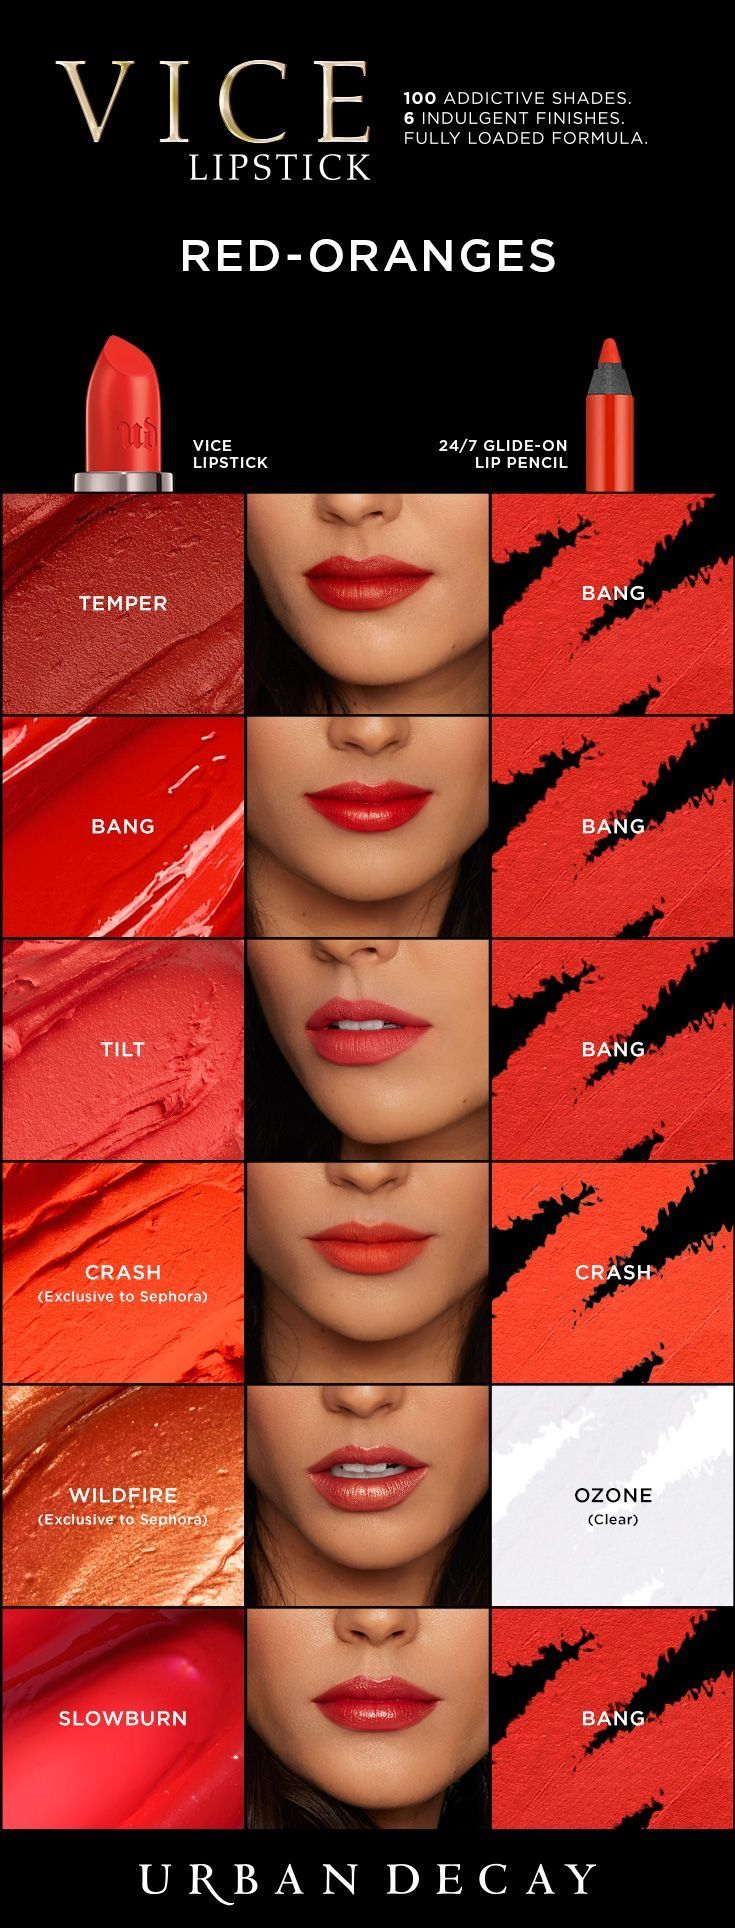 URBAN DECAY Vice Lipsticks - Oranges